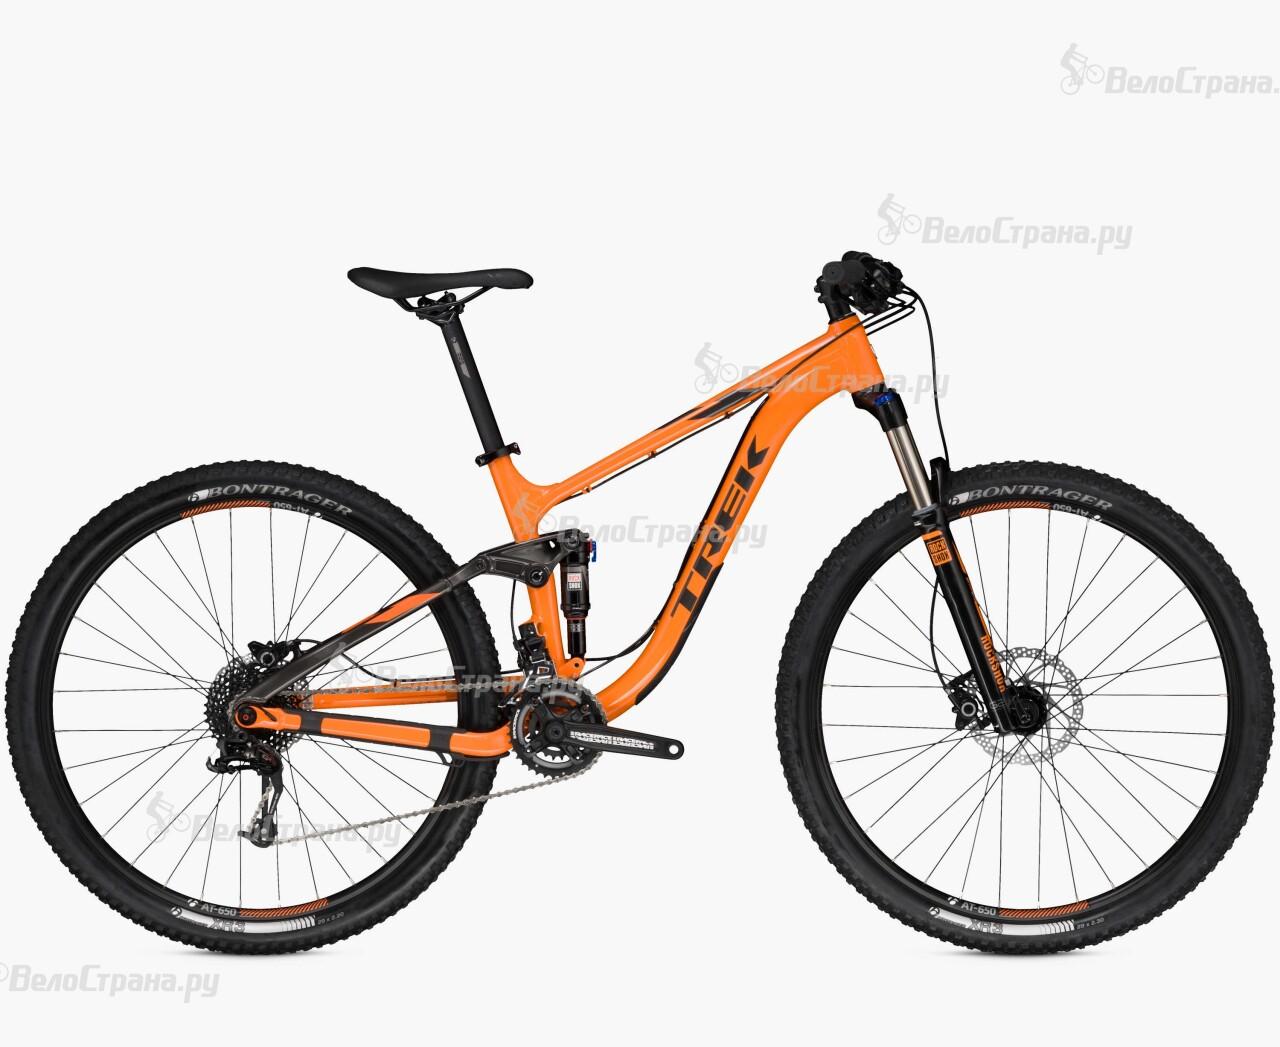 Велосипед Trek Fuel EX 5 29 (2016)